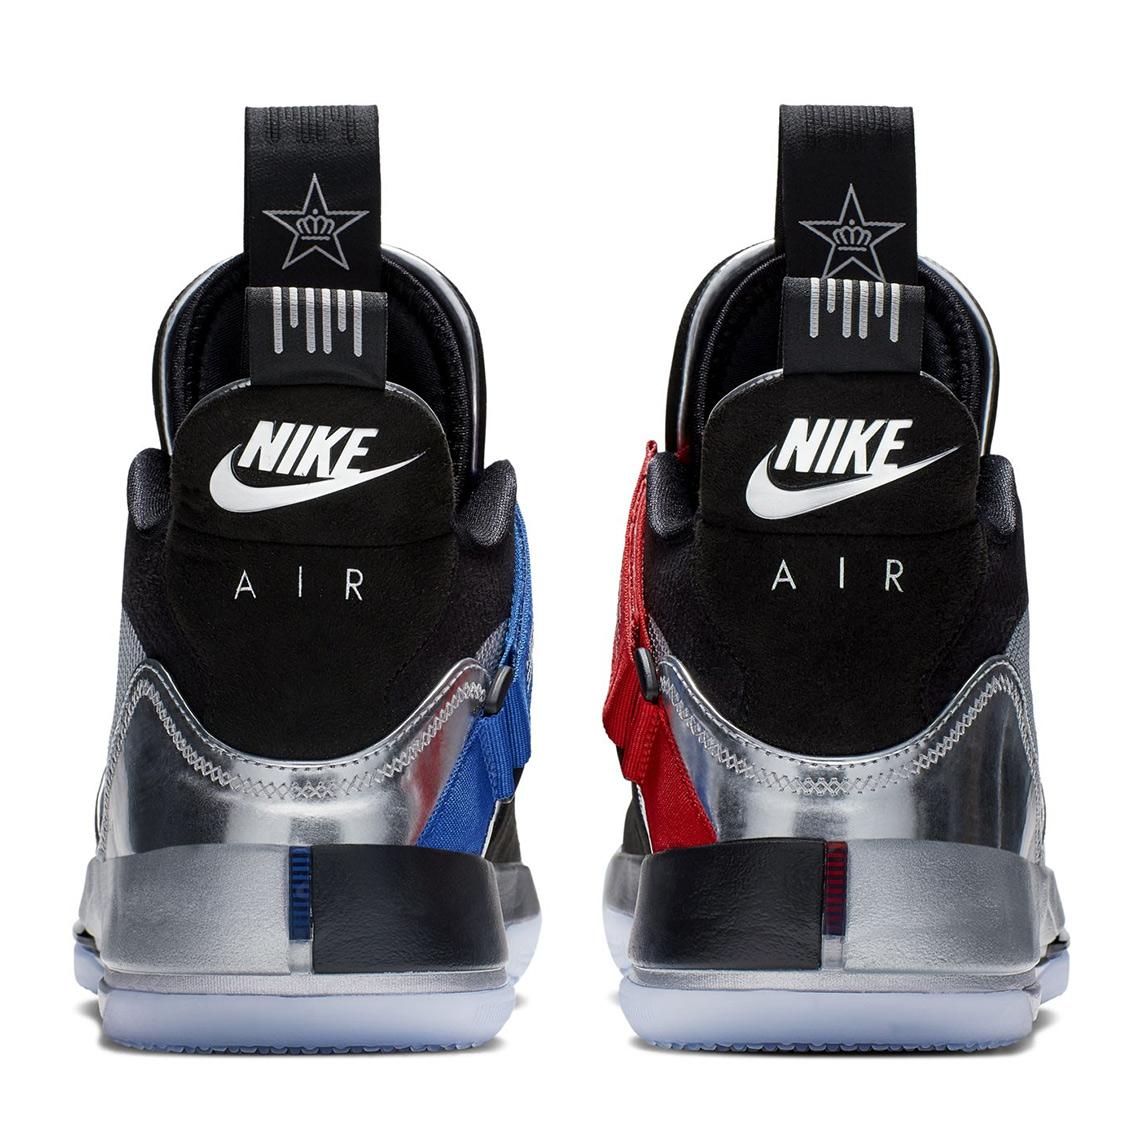 d4a052d59b9 Air Jordan 33 XXXIII All-Star Silver AQ8830-005 Release Date ...